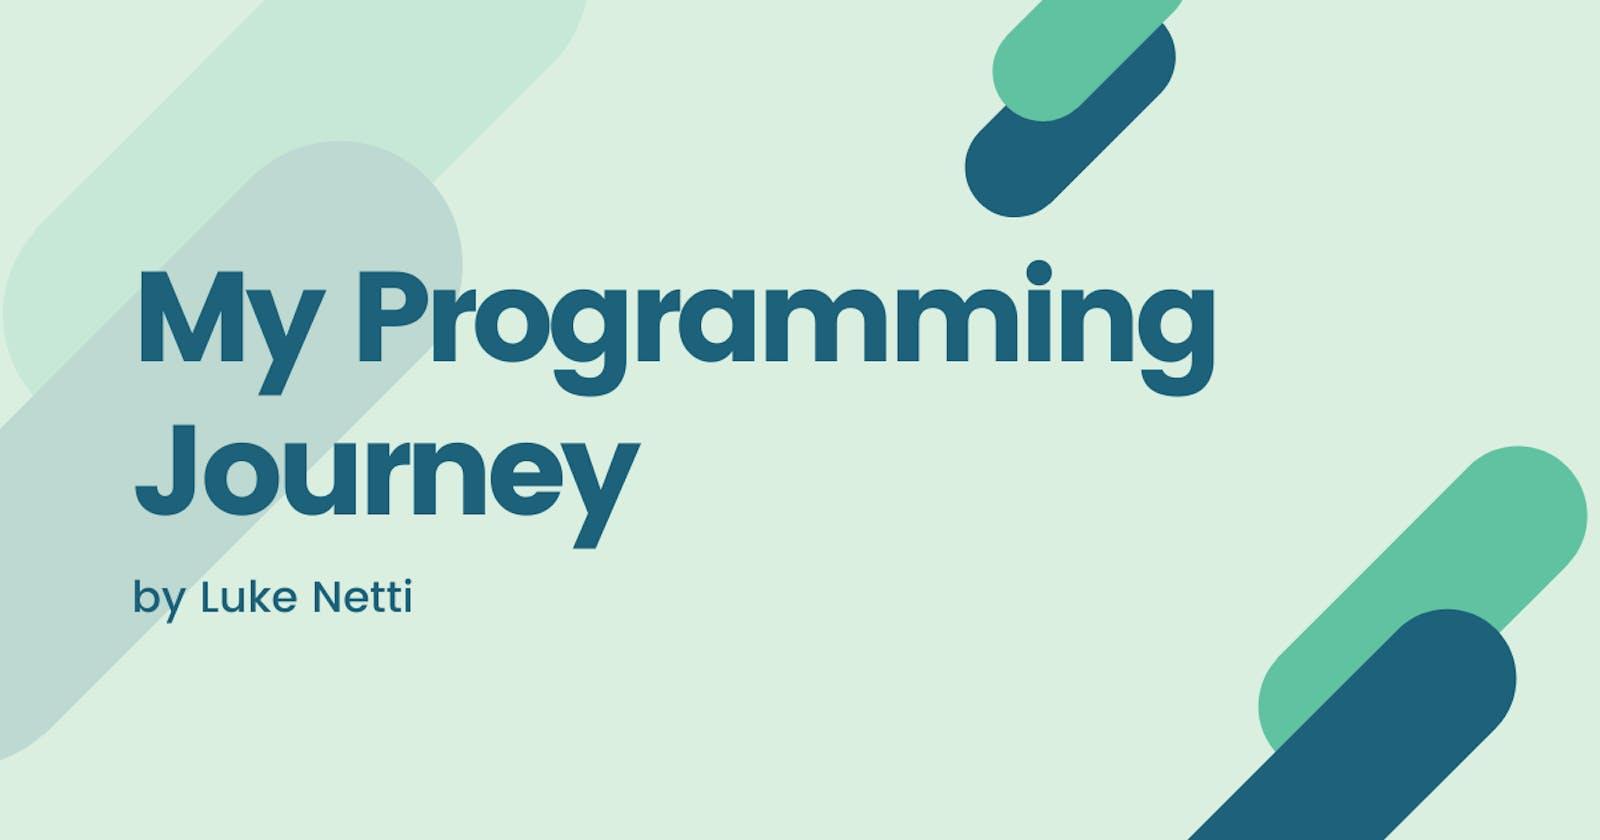 My Programming Journey